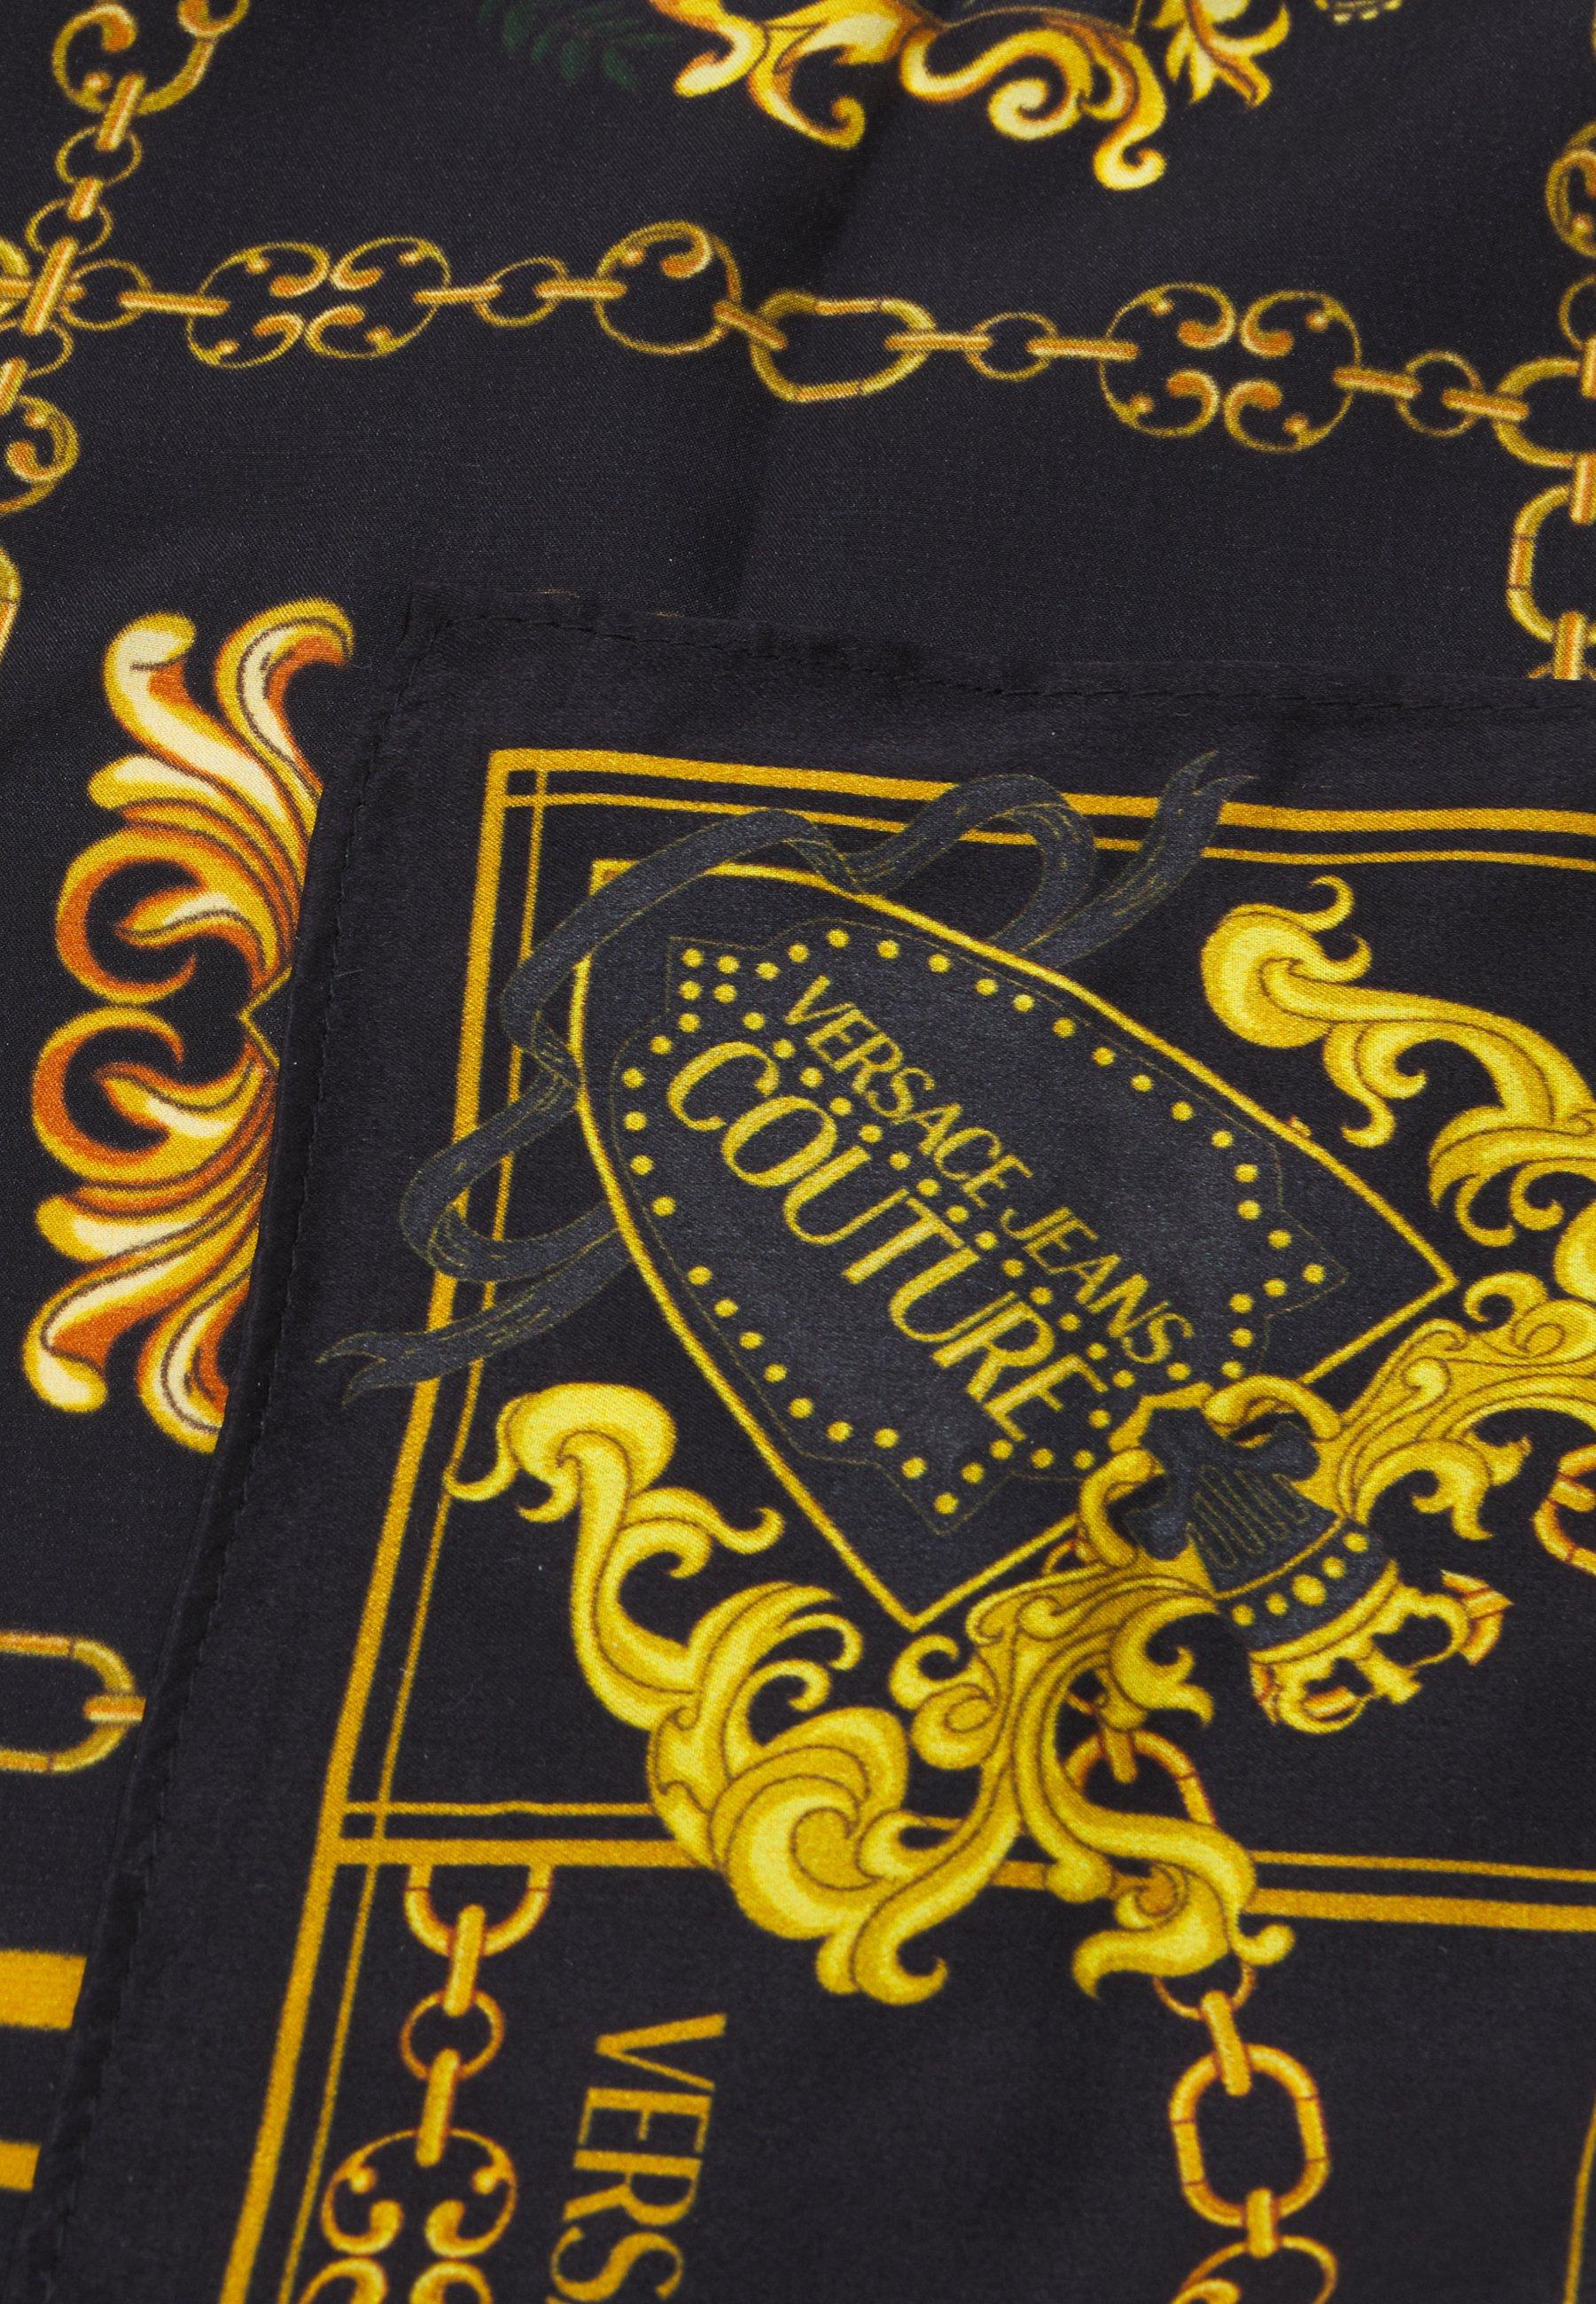 Versace Jeans Couture Sjal - nero/svart 1LWIh4waz4JYdku